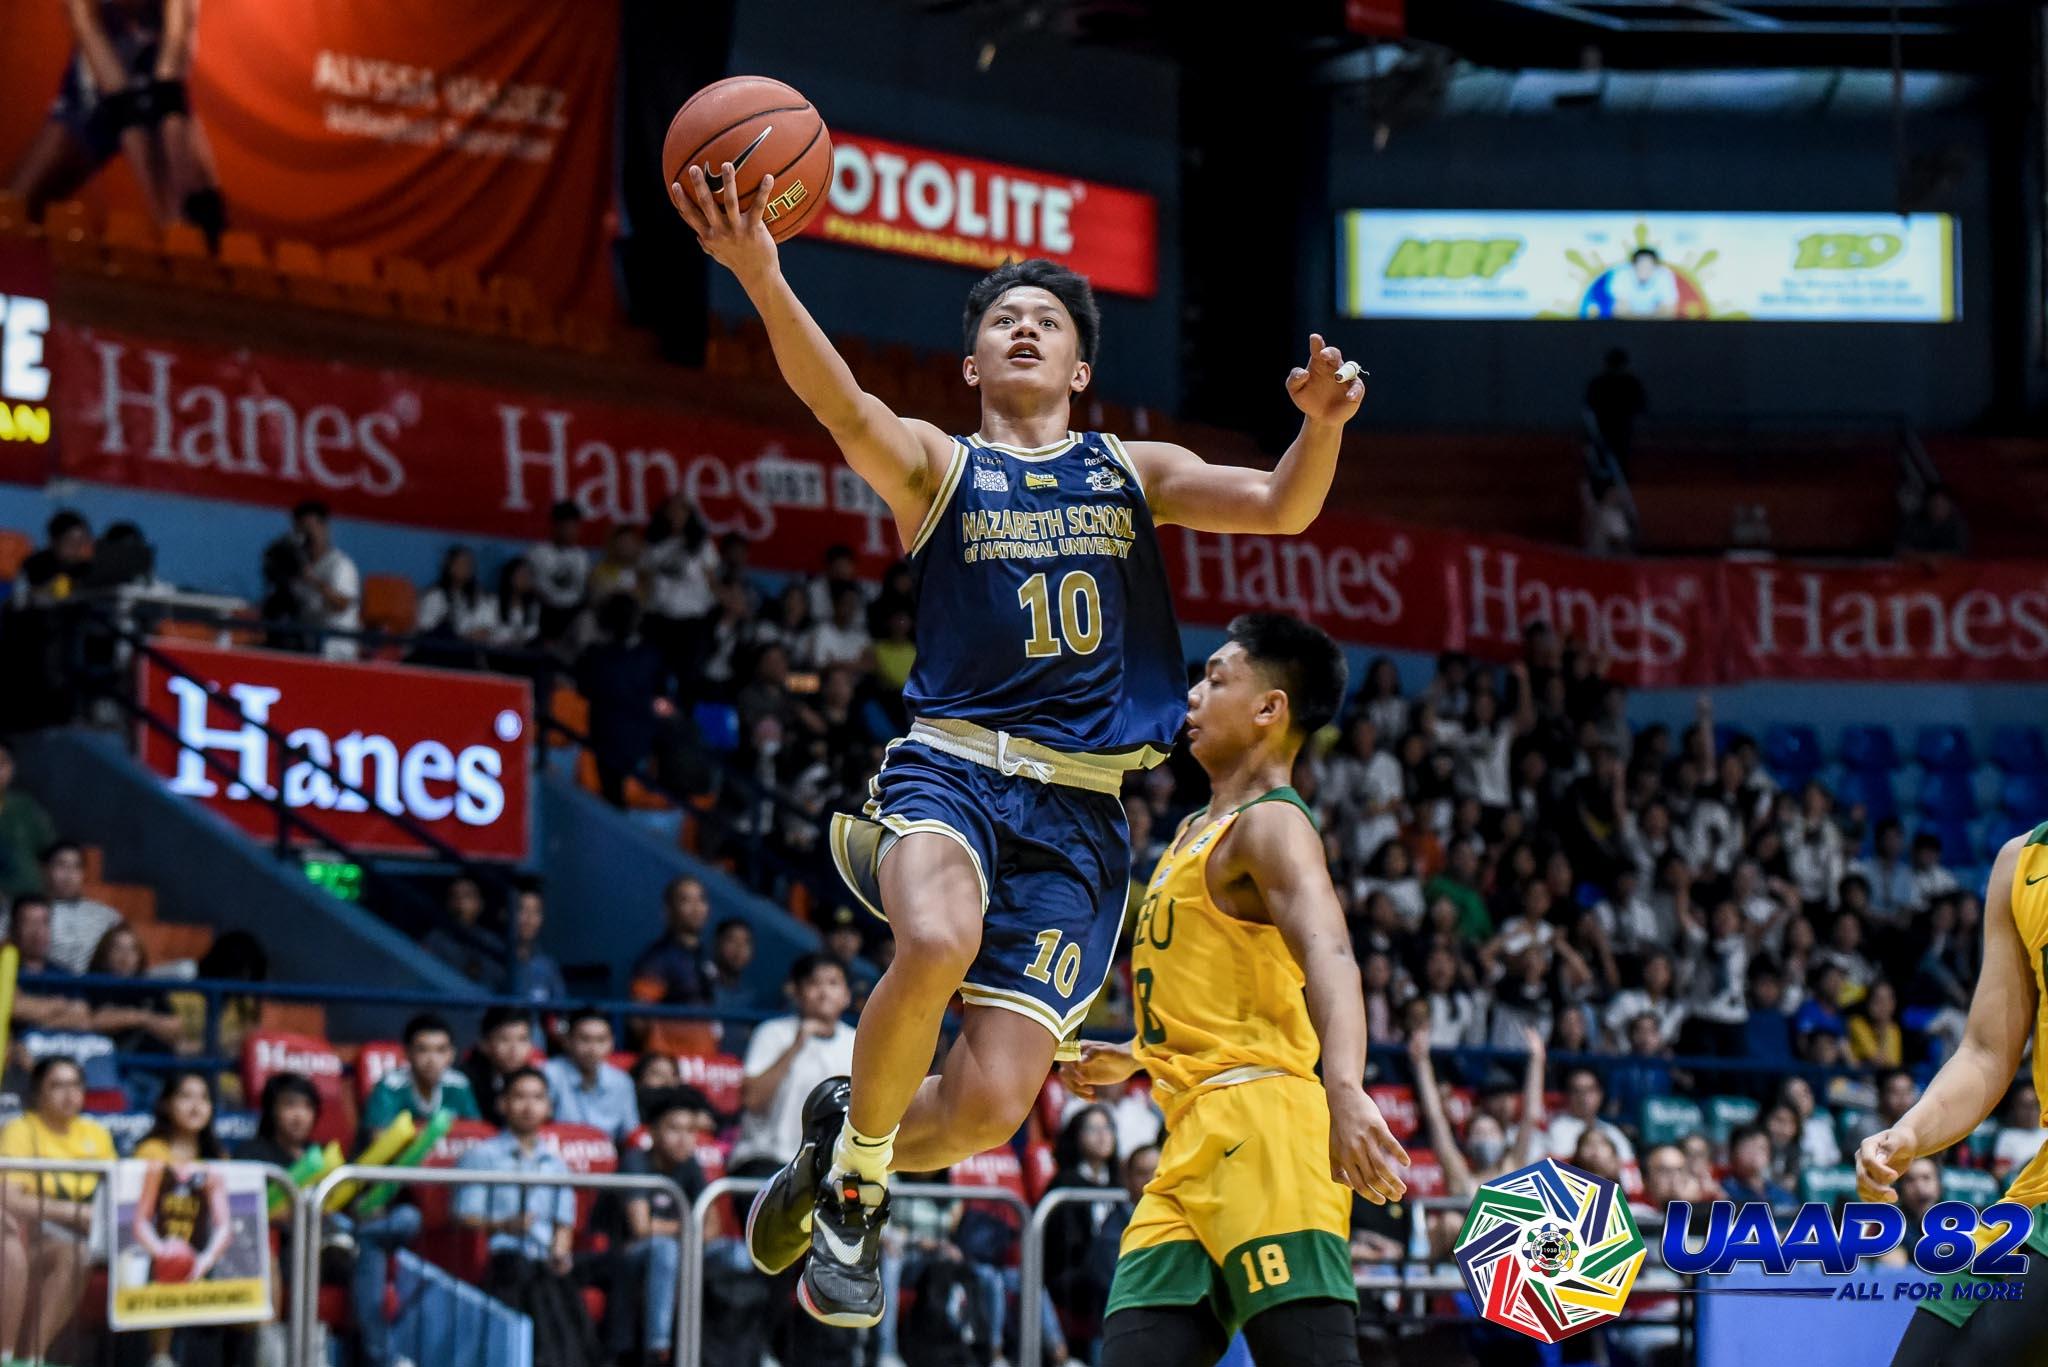 UAAP82-BOYS-BB-FINALS-12TH-PHOTO-NU-FORTEA Fortea, Figueroa, Estacio lead crack UAAP HS class of '21 ADMU Basketball FEU News NU UAAP UP UST  - philippine sports news